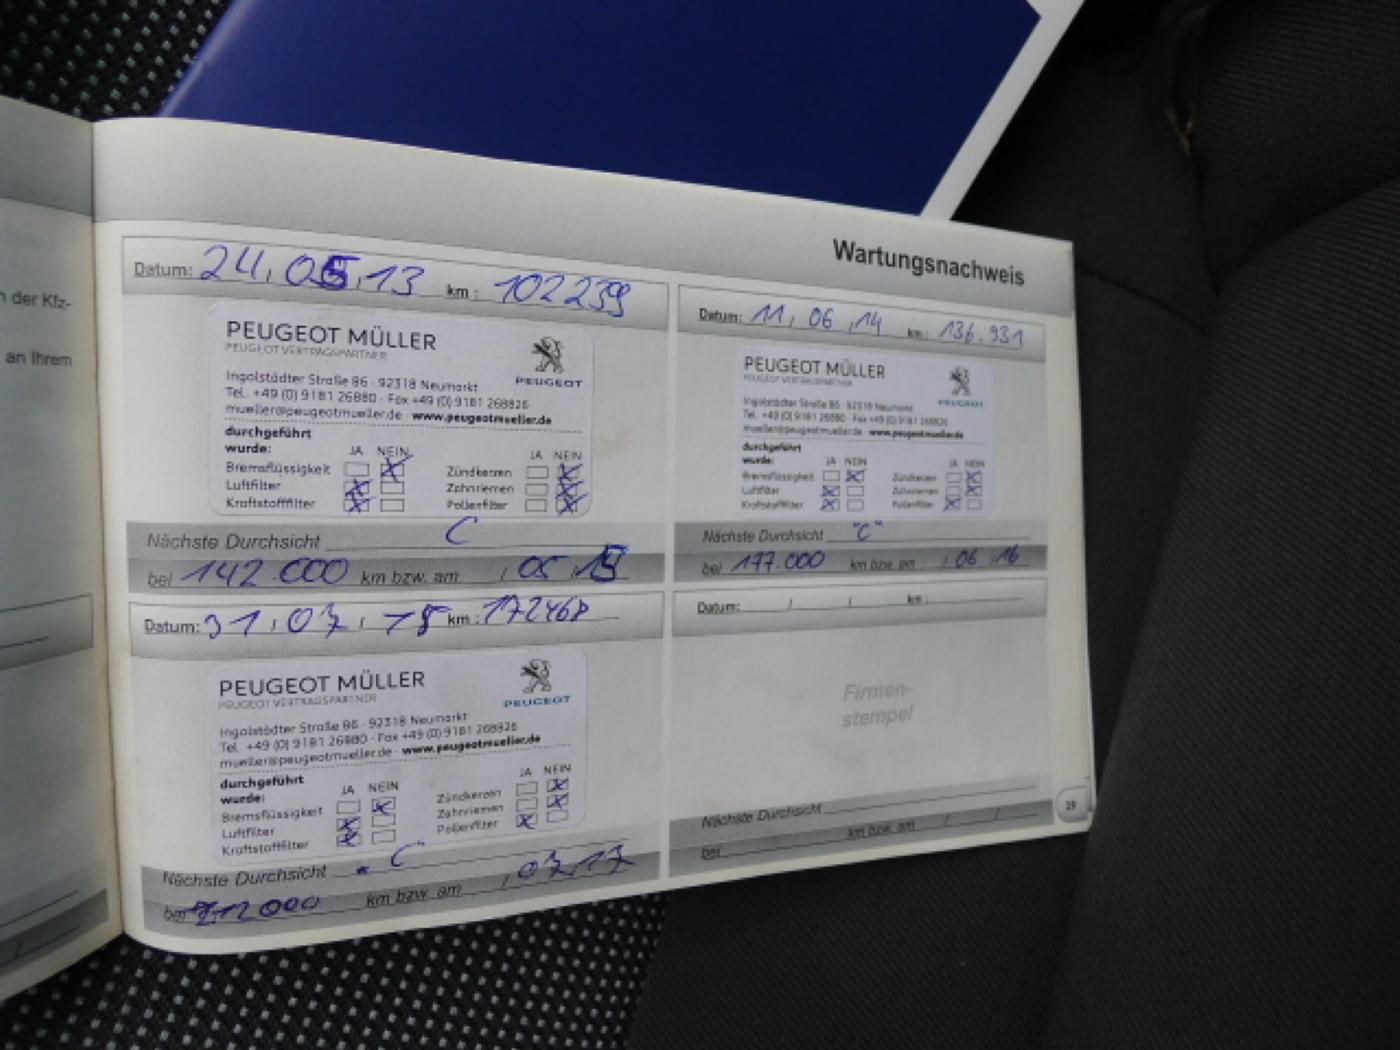 Peugeot Boxer 2.2 HDI L2H2 Klima Akce!!! Novinka - 17